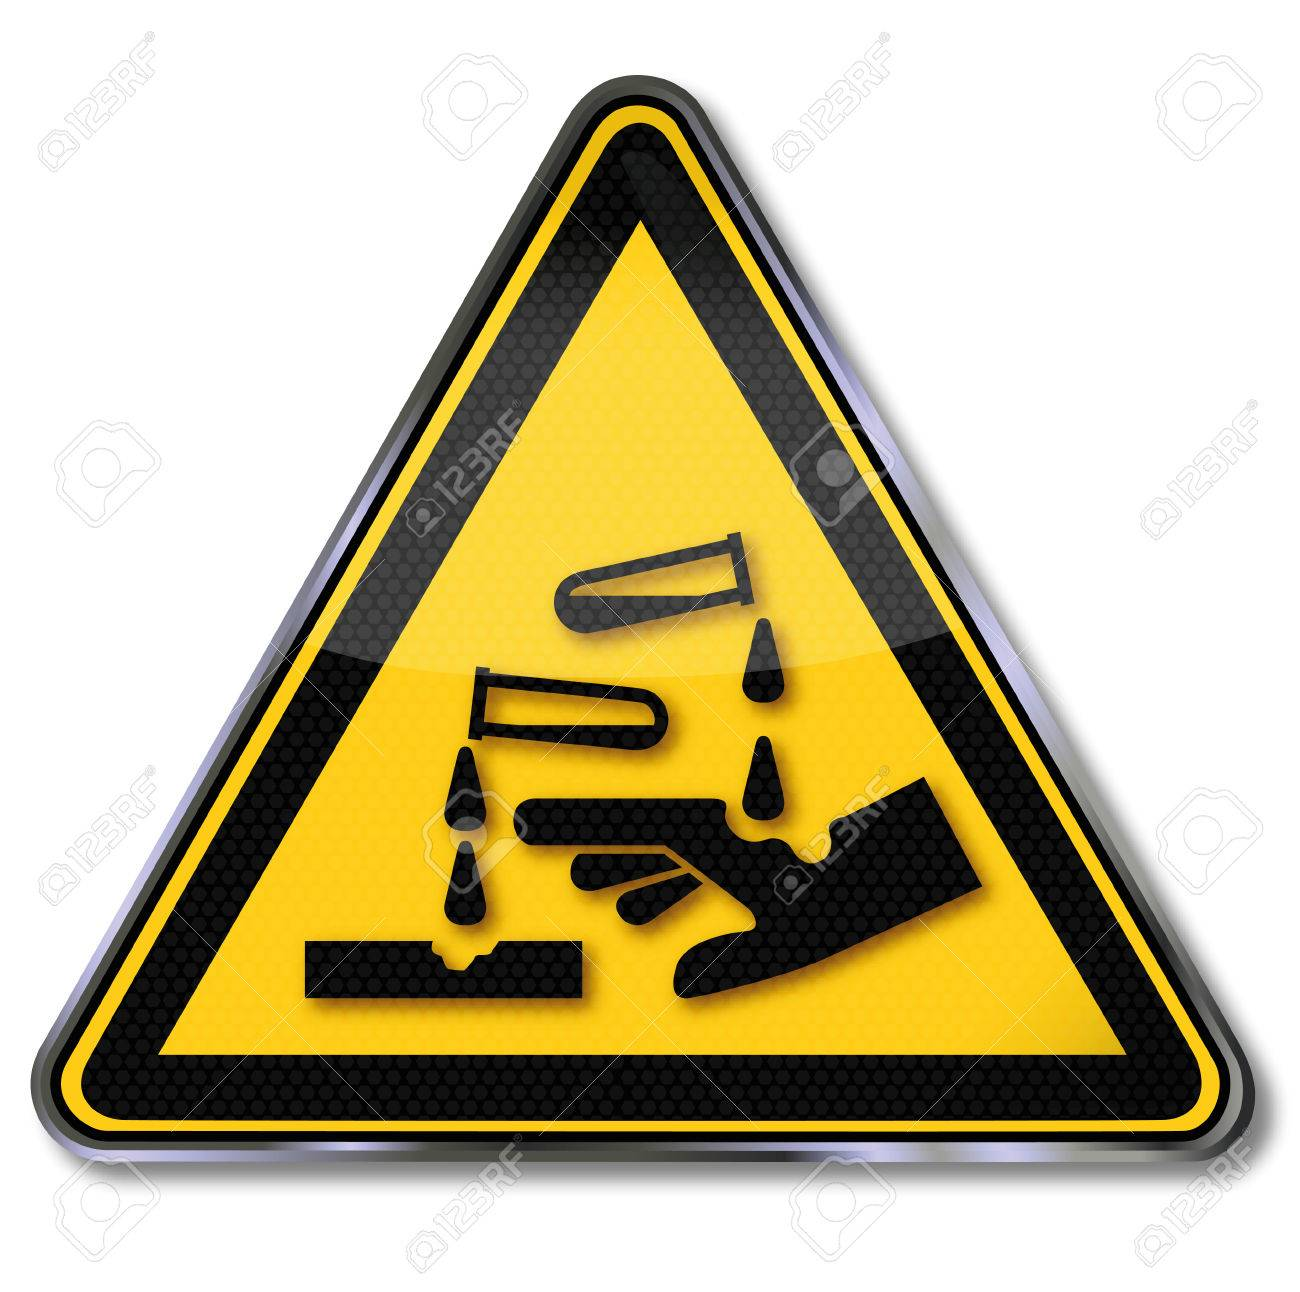 Warning sign corrosive substances - 25126628